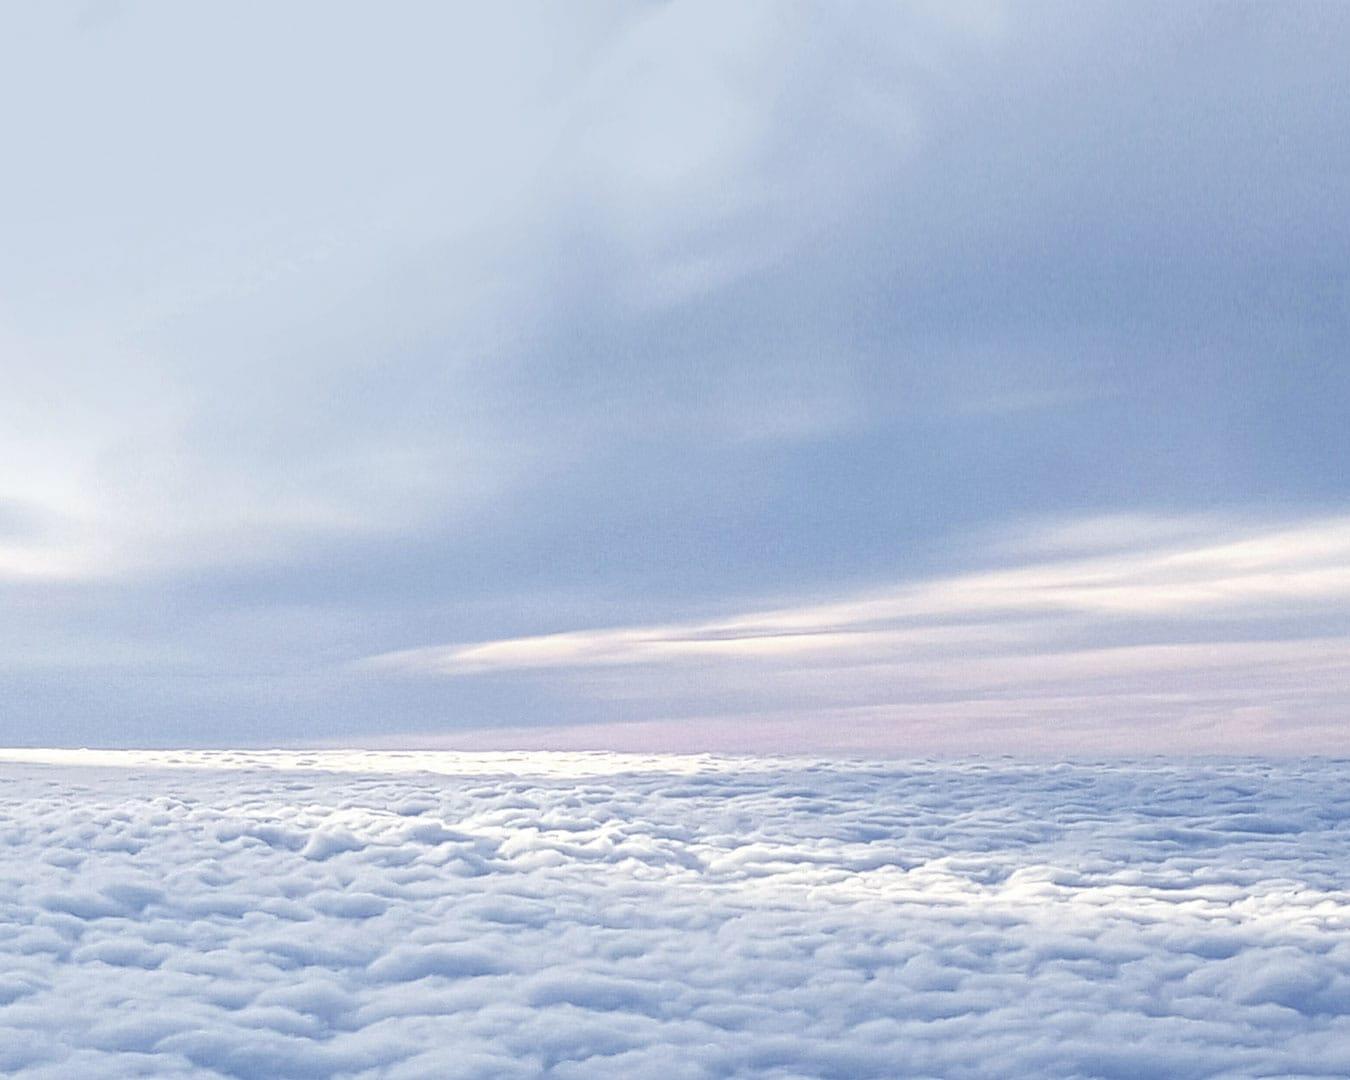 Accessoires, Devialet, Phantom, Treepod, sky, ciel